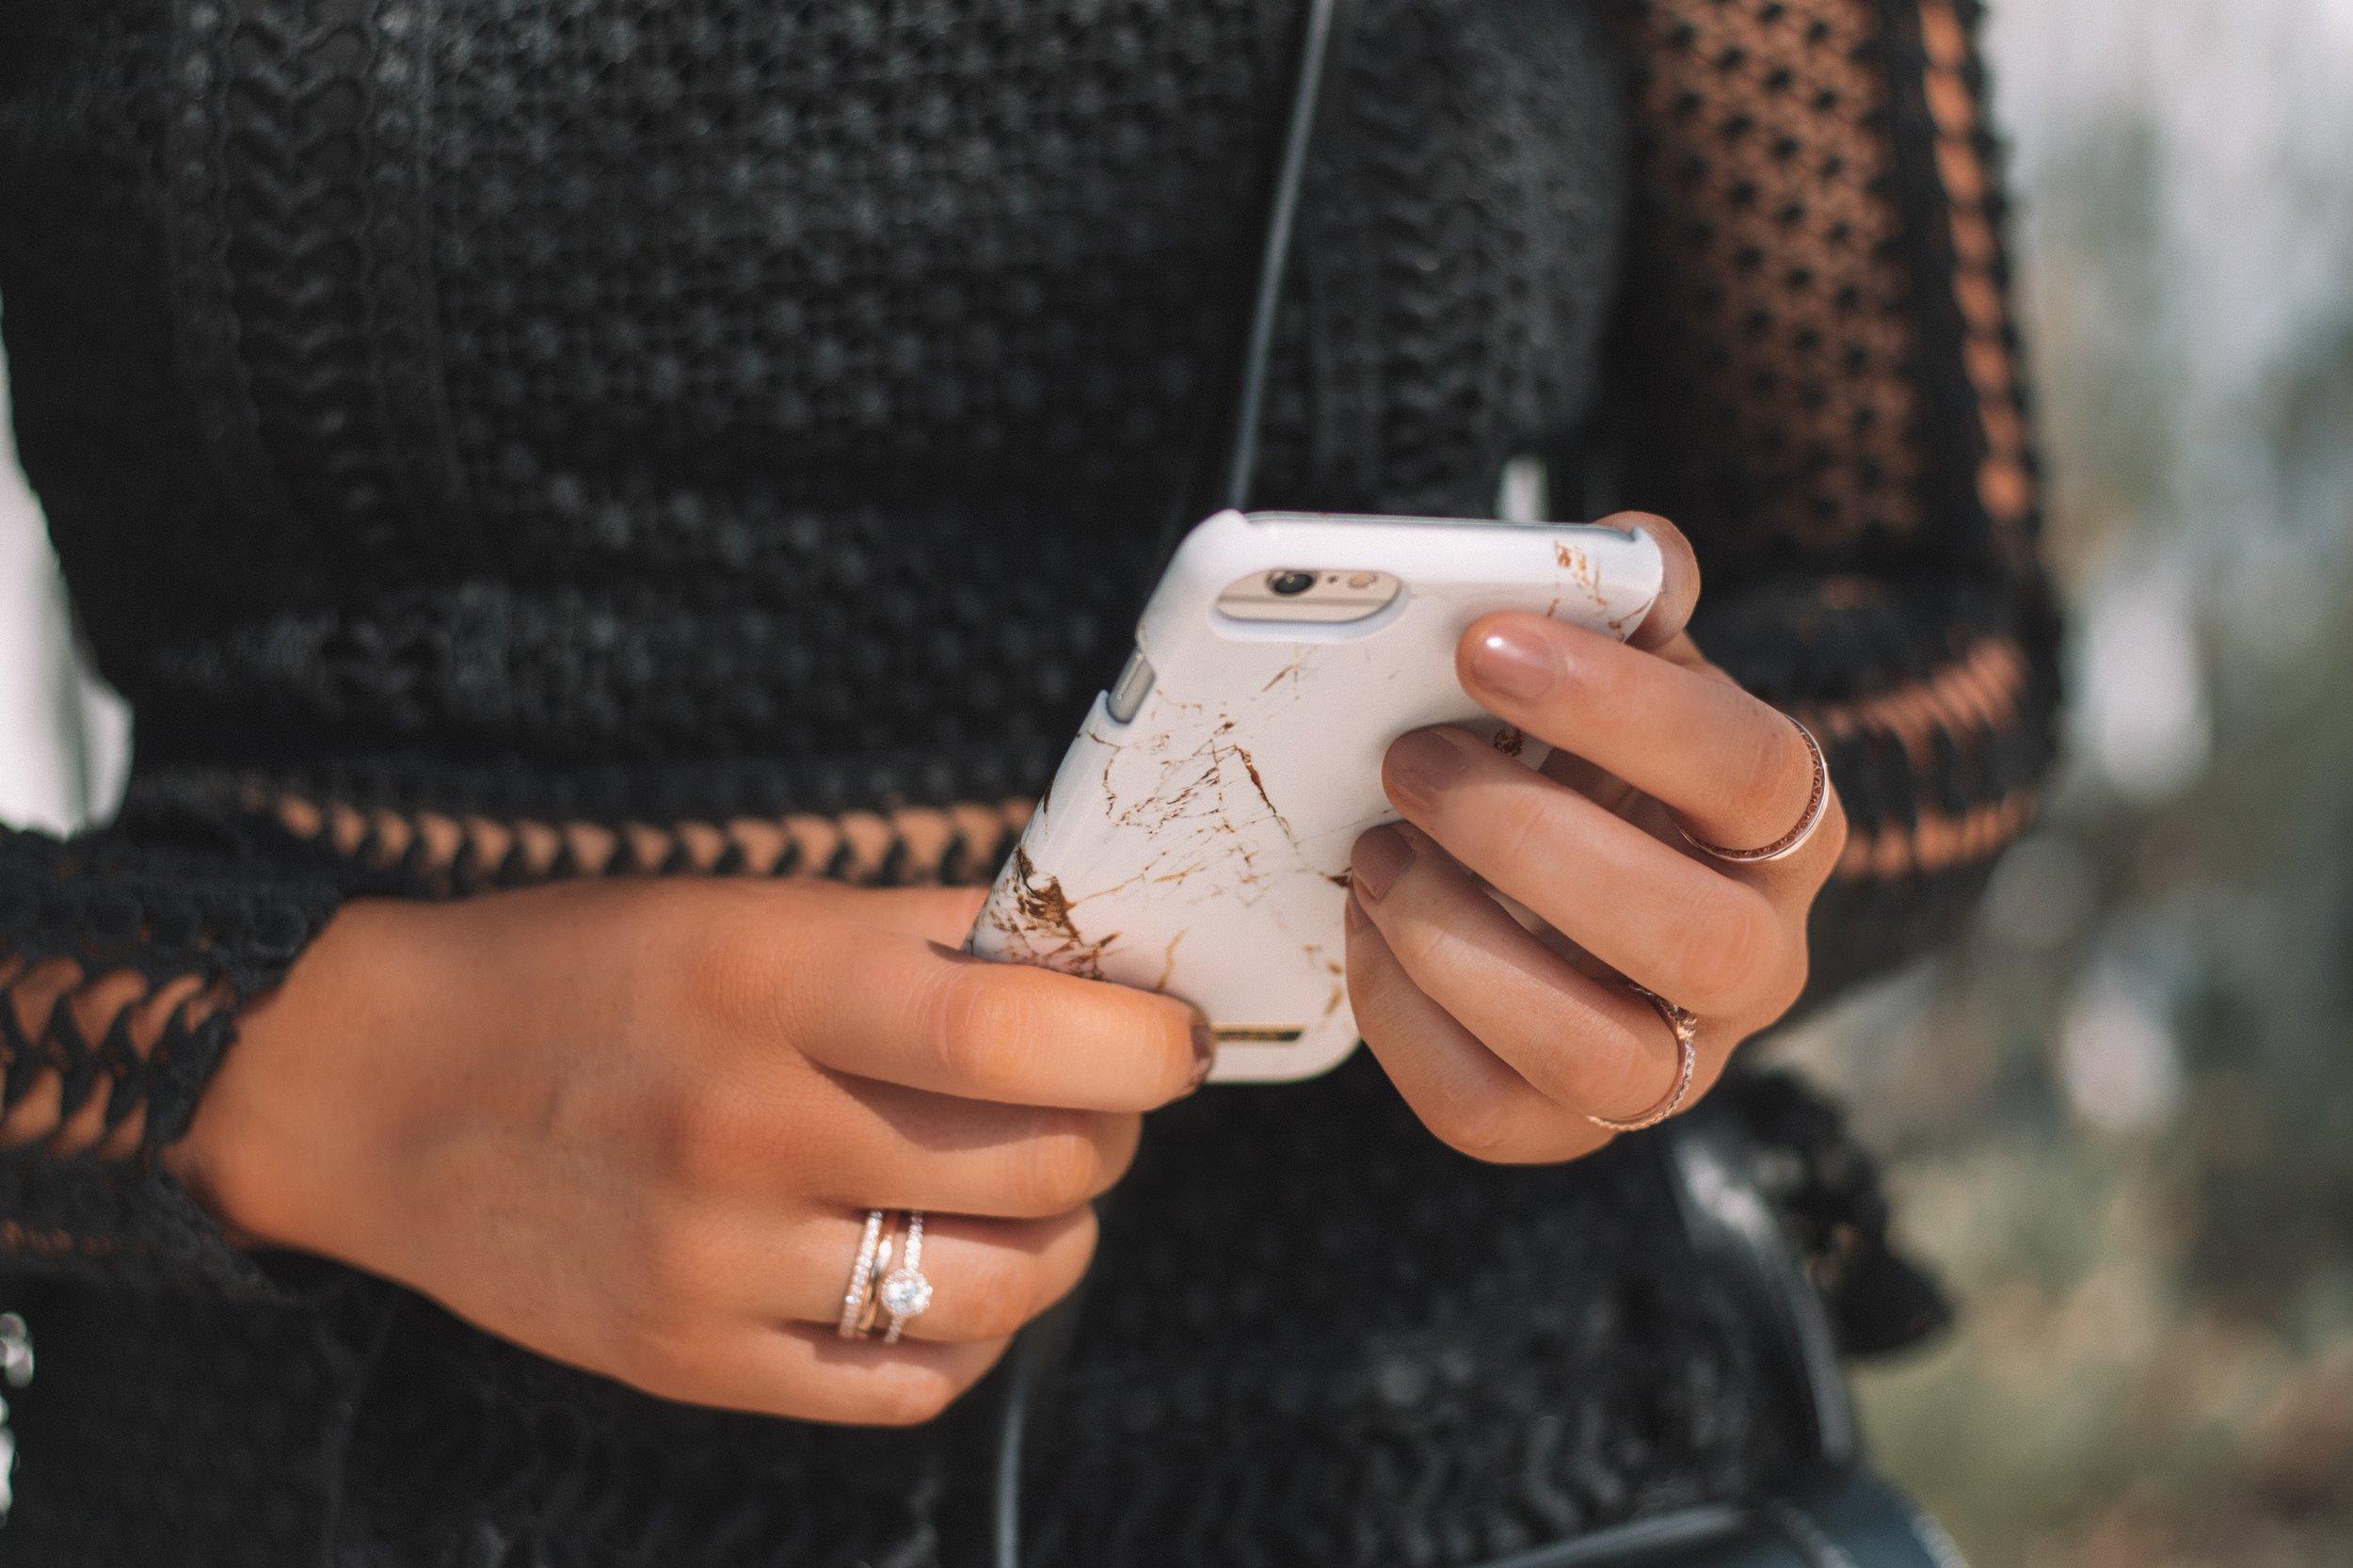 iDeal Sweden Marble Phone Case 1 - Izzy Wears Blog